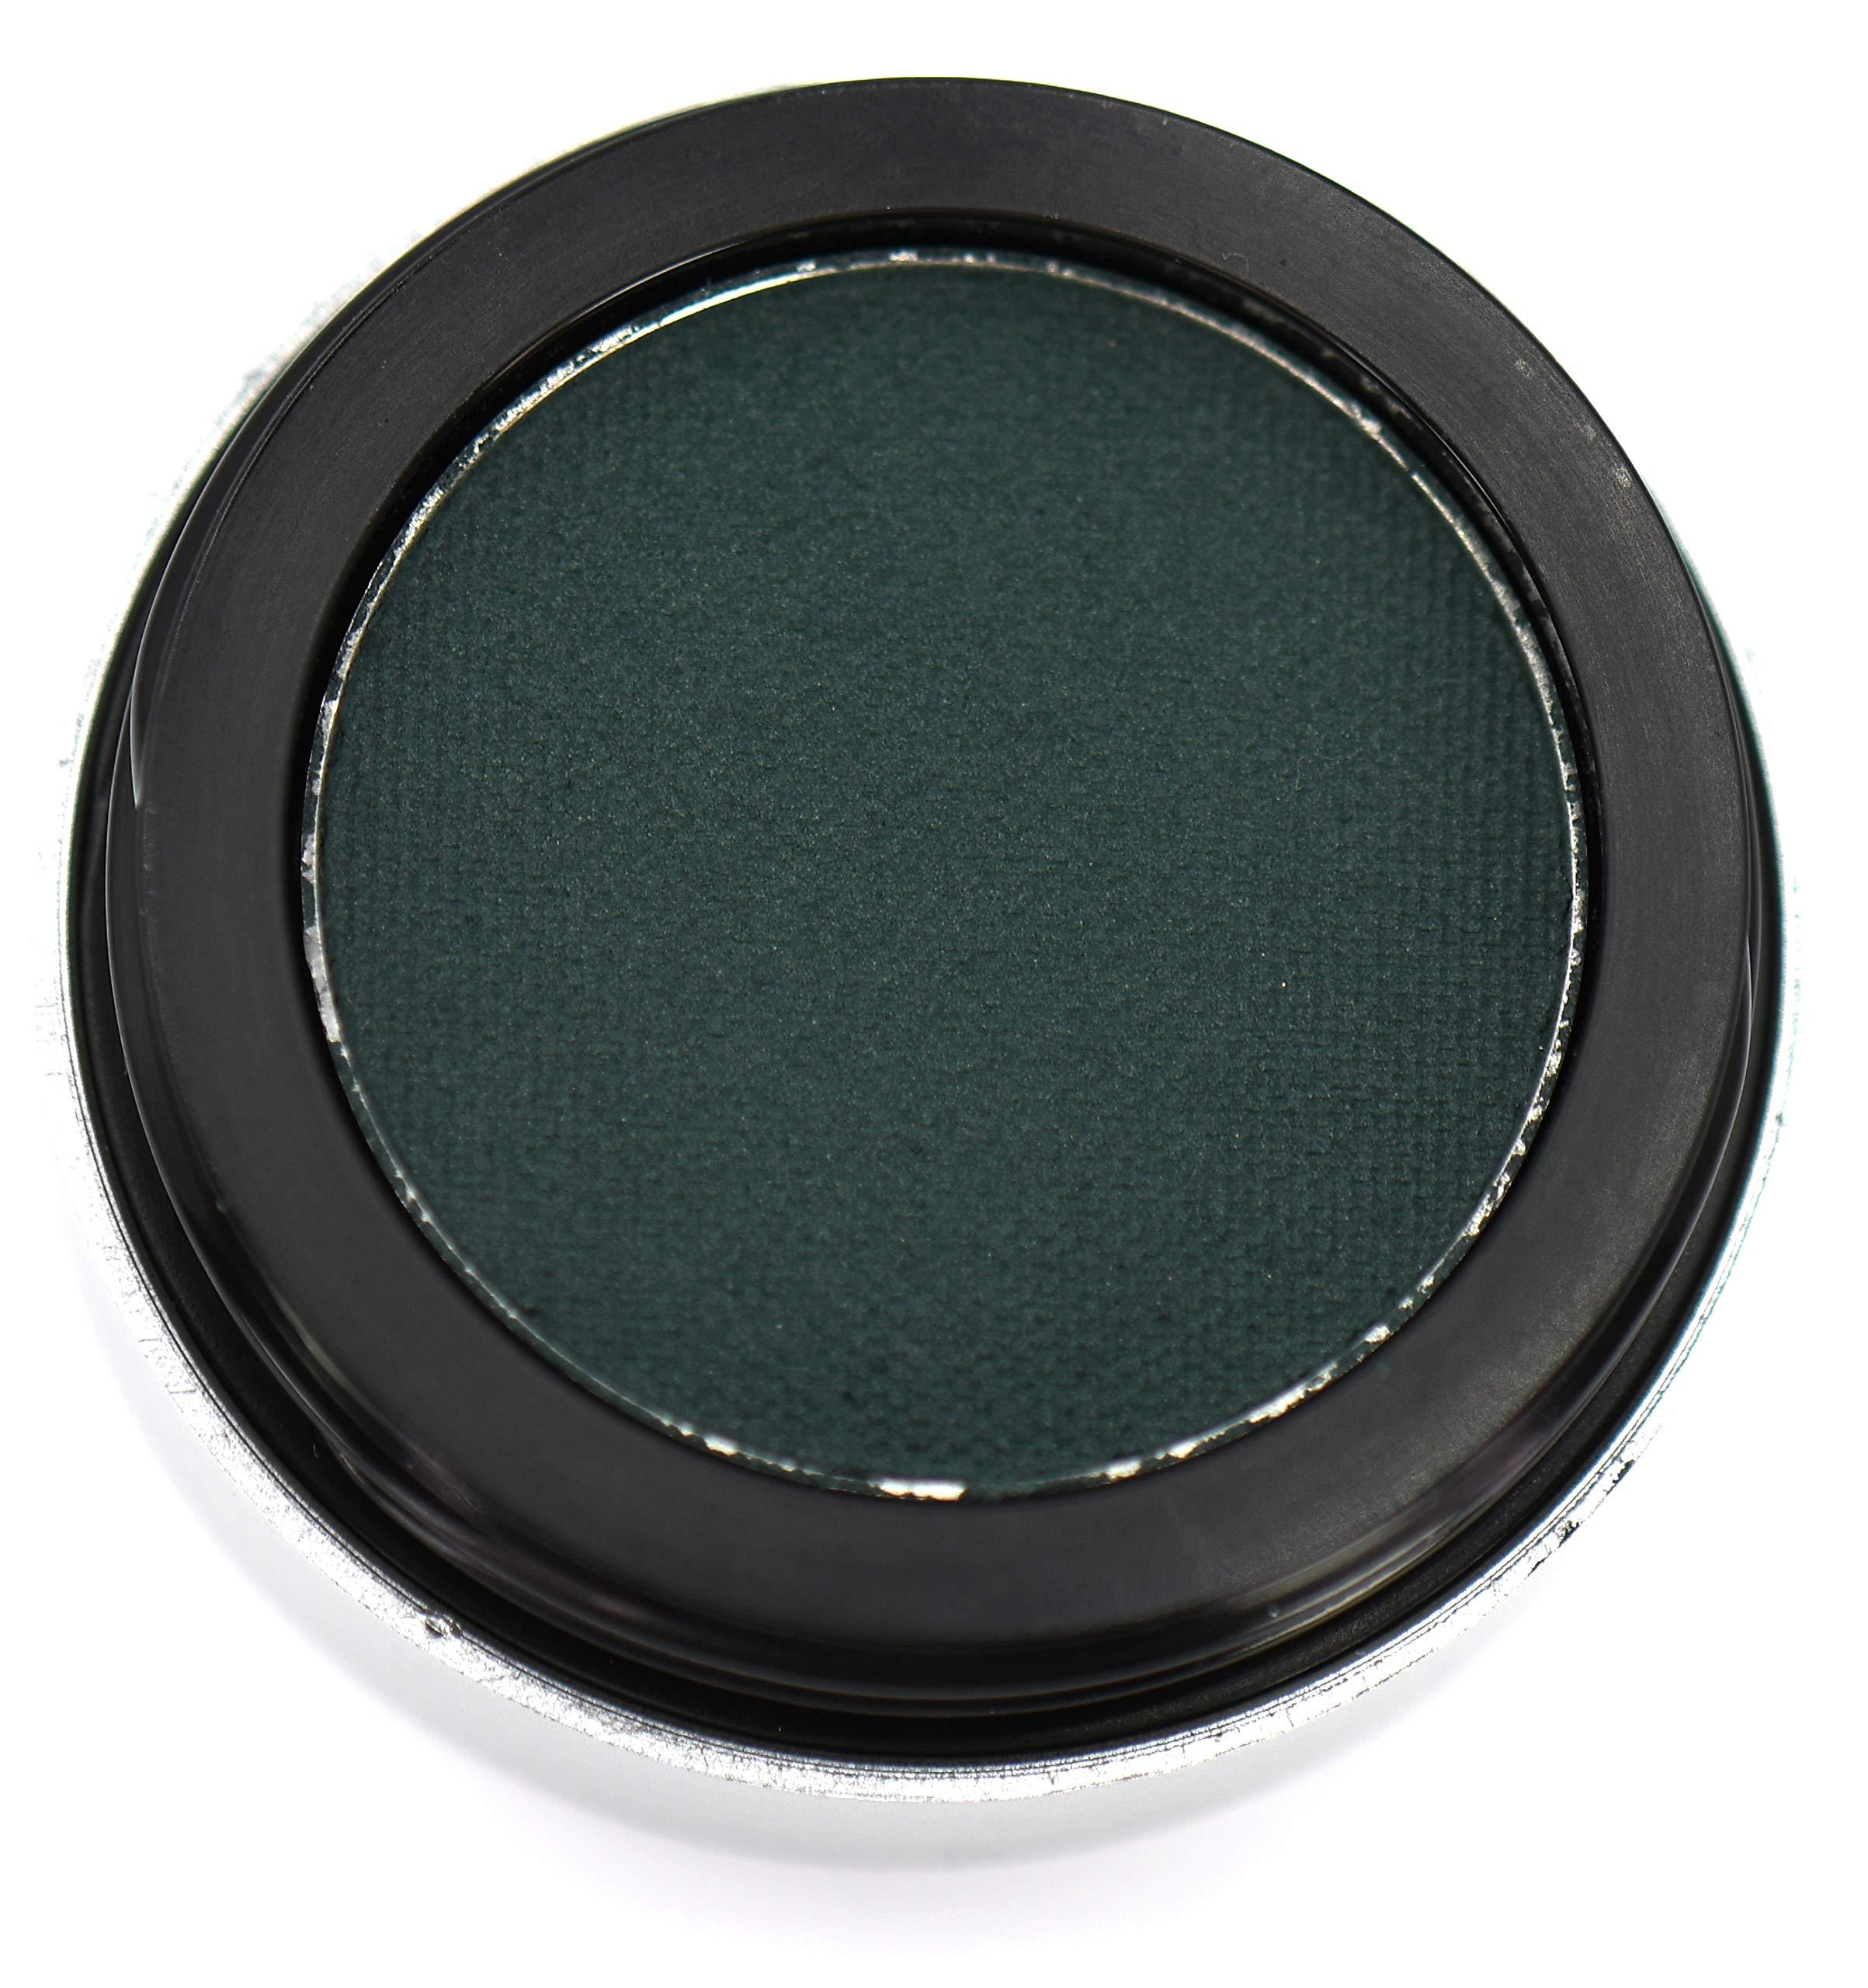 THE ORIGINAL Pure Ziva Matte Forest Emerald Green Wet Dry Pressed Powder Cake Eyeliner Eyeshadow HD Professional, Deep Pigment, No Smudge, Gluten Free, No Animal Testing, Cruelty Free & Vegan